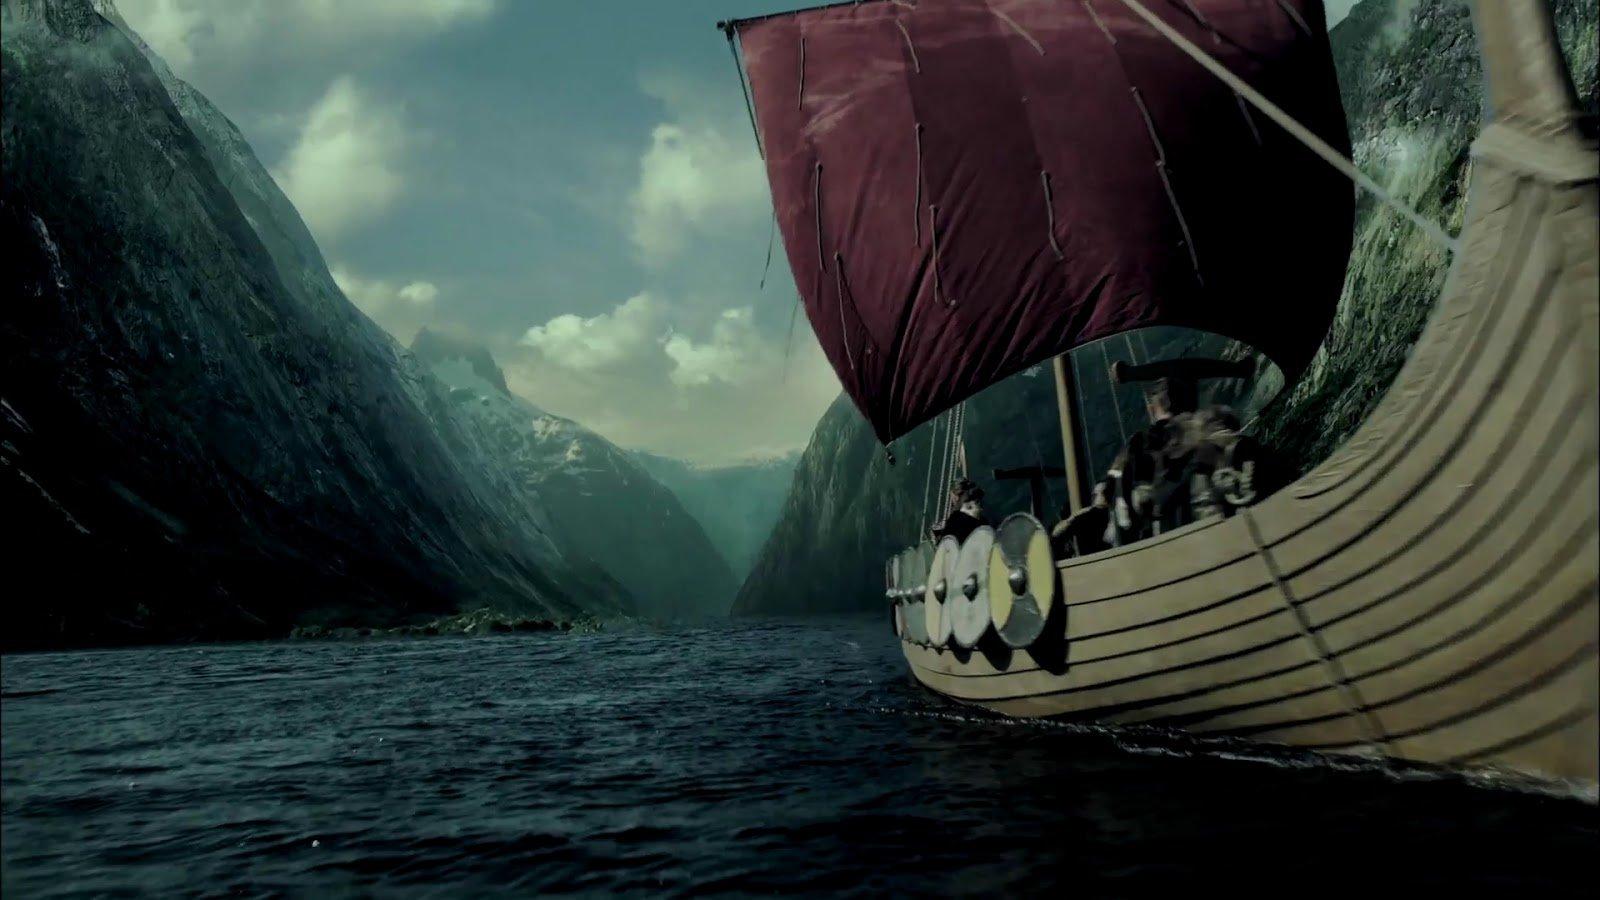 Hd Wallpapers Ragnar Vikings History Channel 3000 X 2000 1166 Kb Jpeg 1600x900